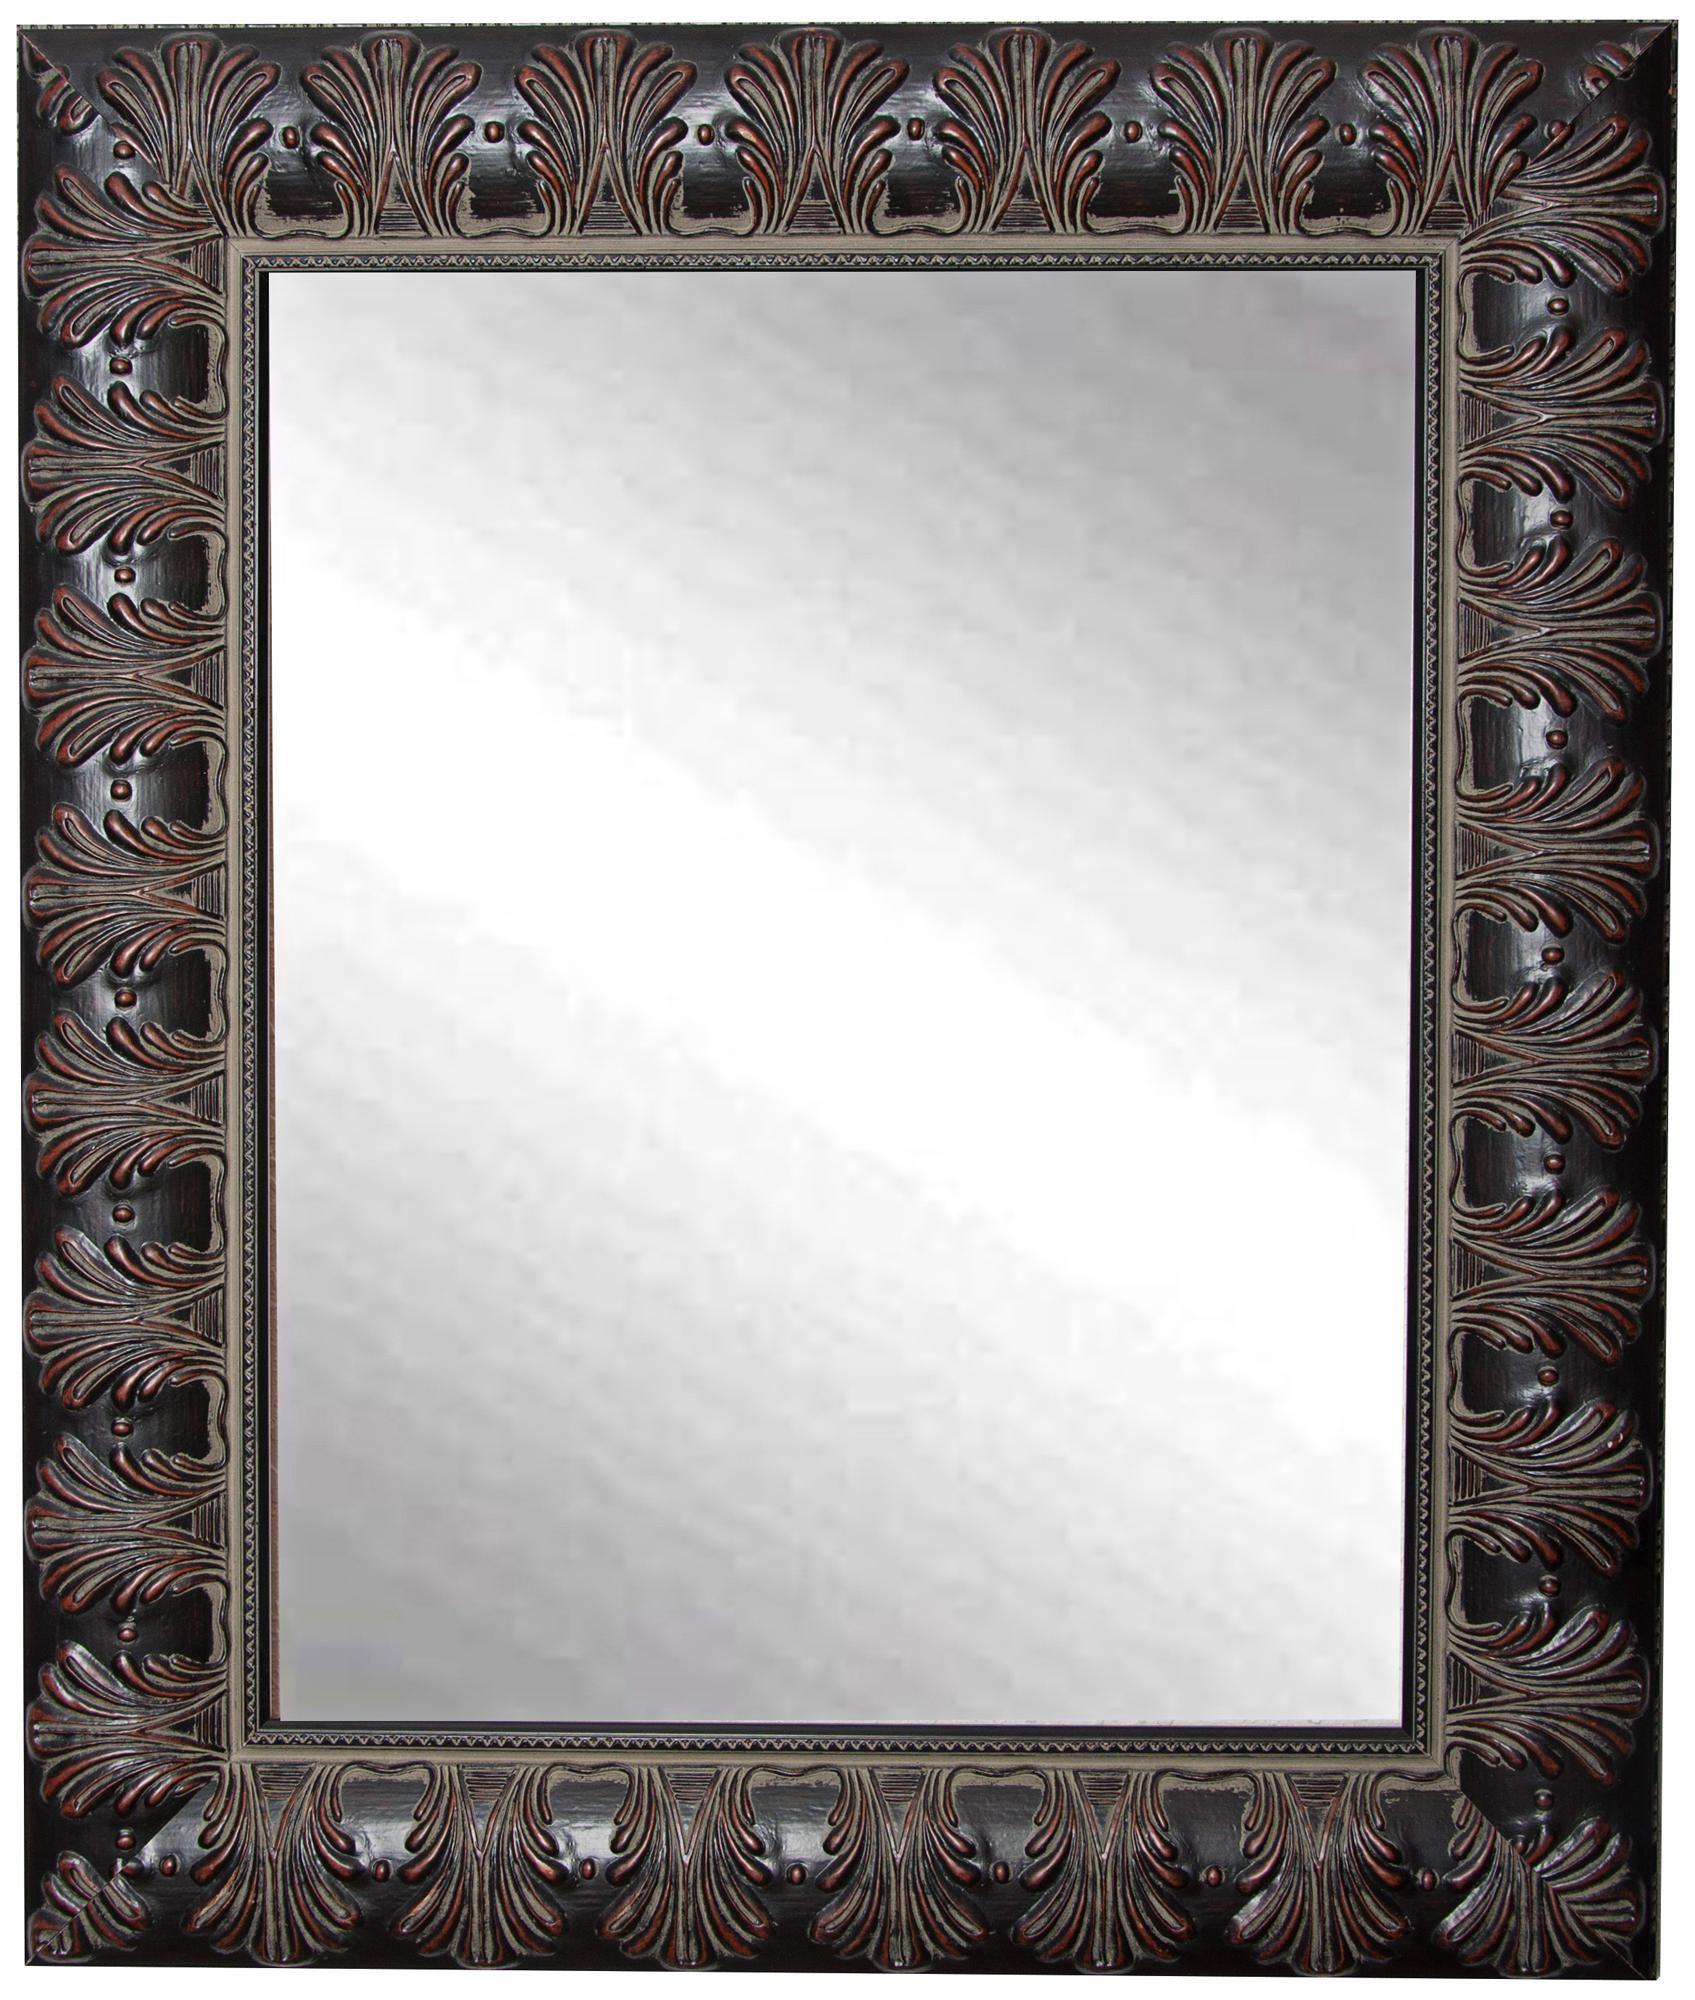 Grantly Mahogany Accent 30 1 2 X 36 1 2 Wall Mirror 6x308 Lamps Plus In 2020 Mahogany Accents Mirror Wall Mirror [ 2000 x 1695 Pixel ]